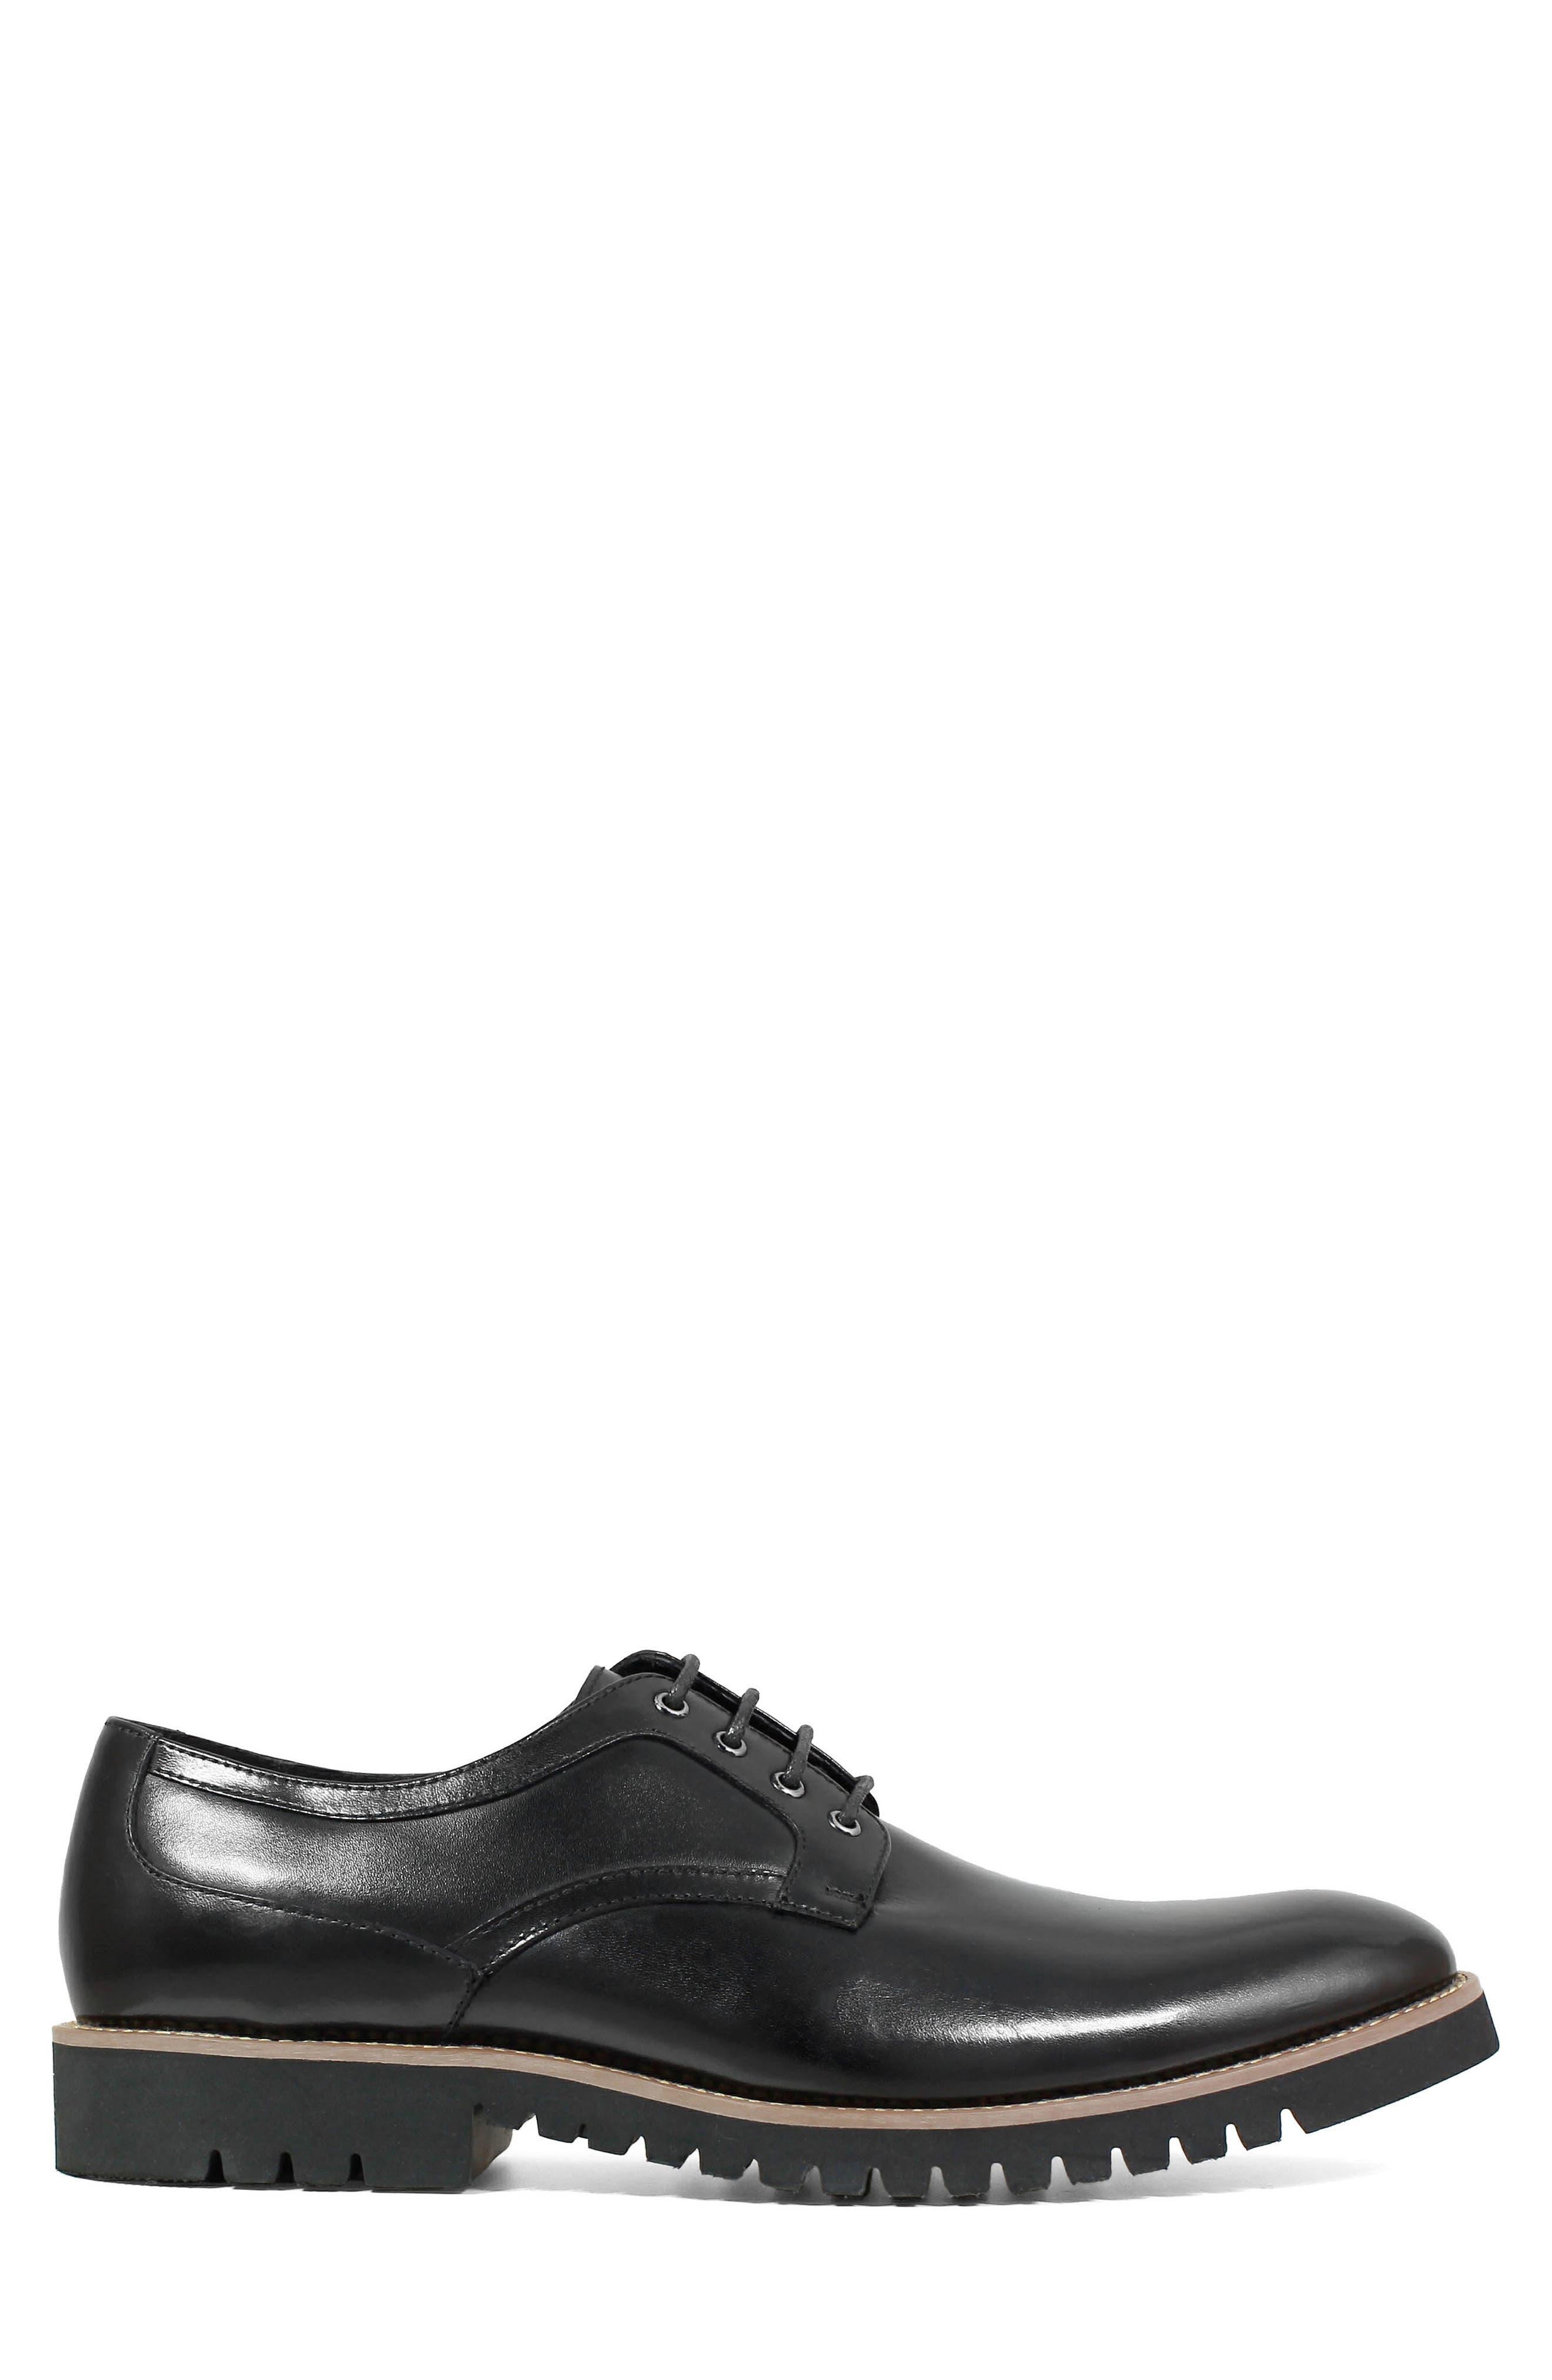 Barclay Plain Toe Derby,                             Alternate thumbnail 7, color,                             BLACK LEATHER